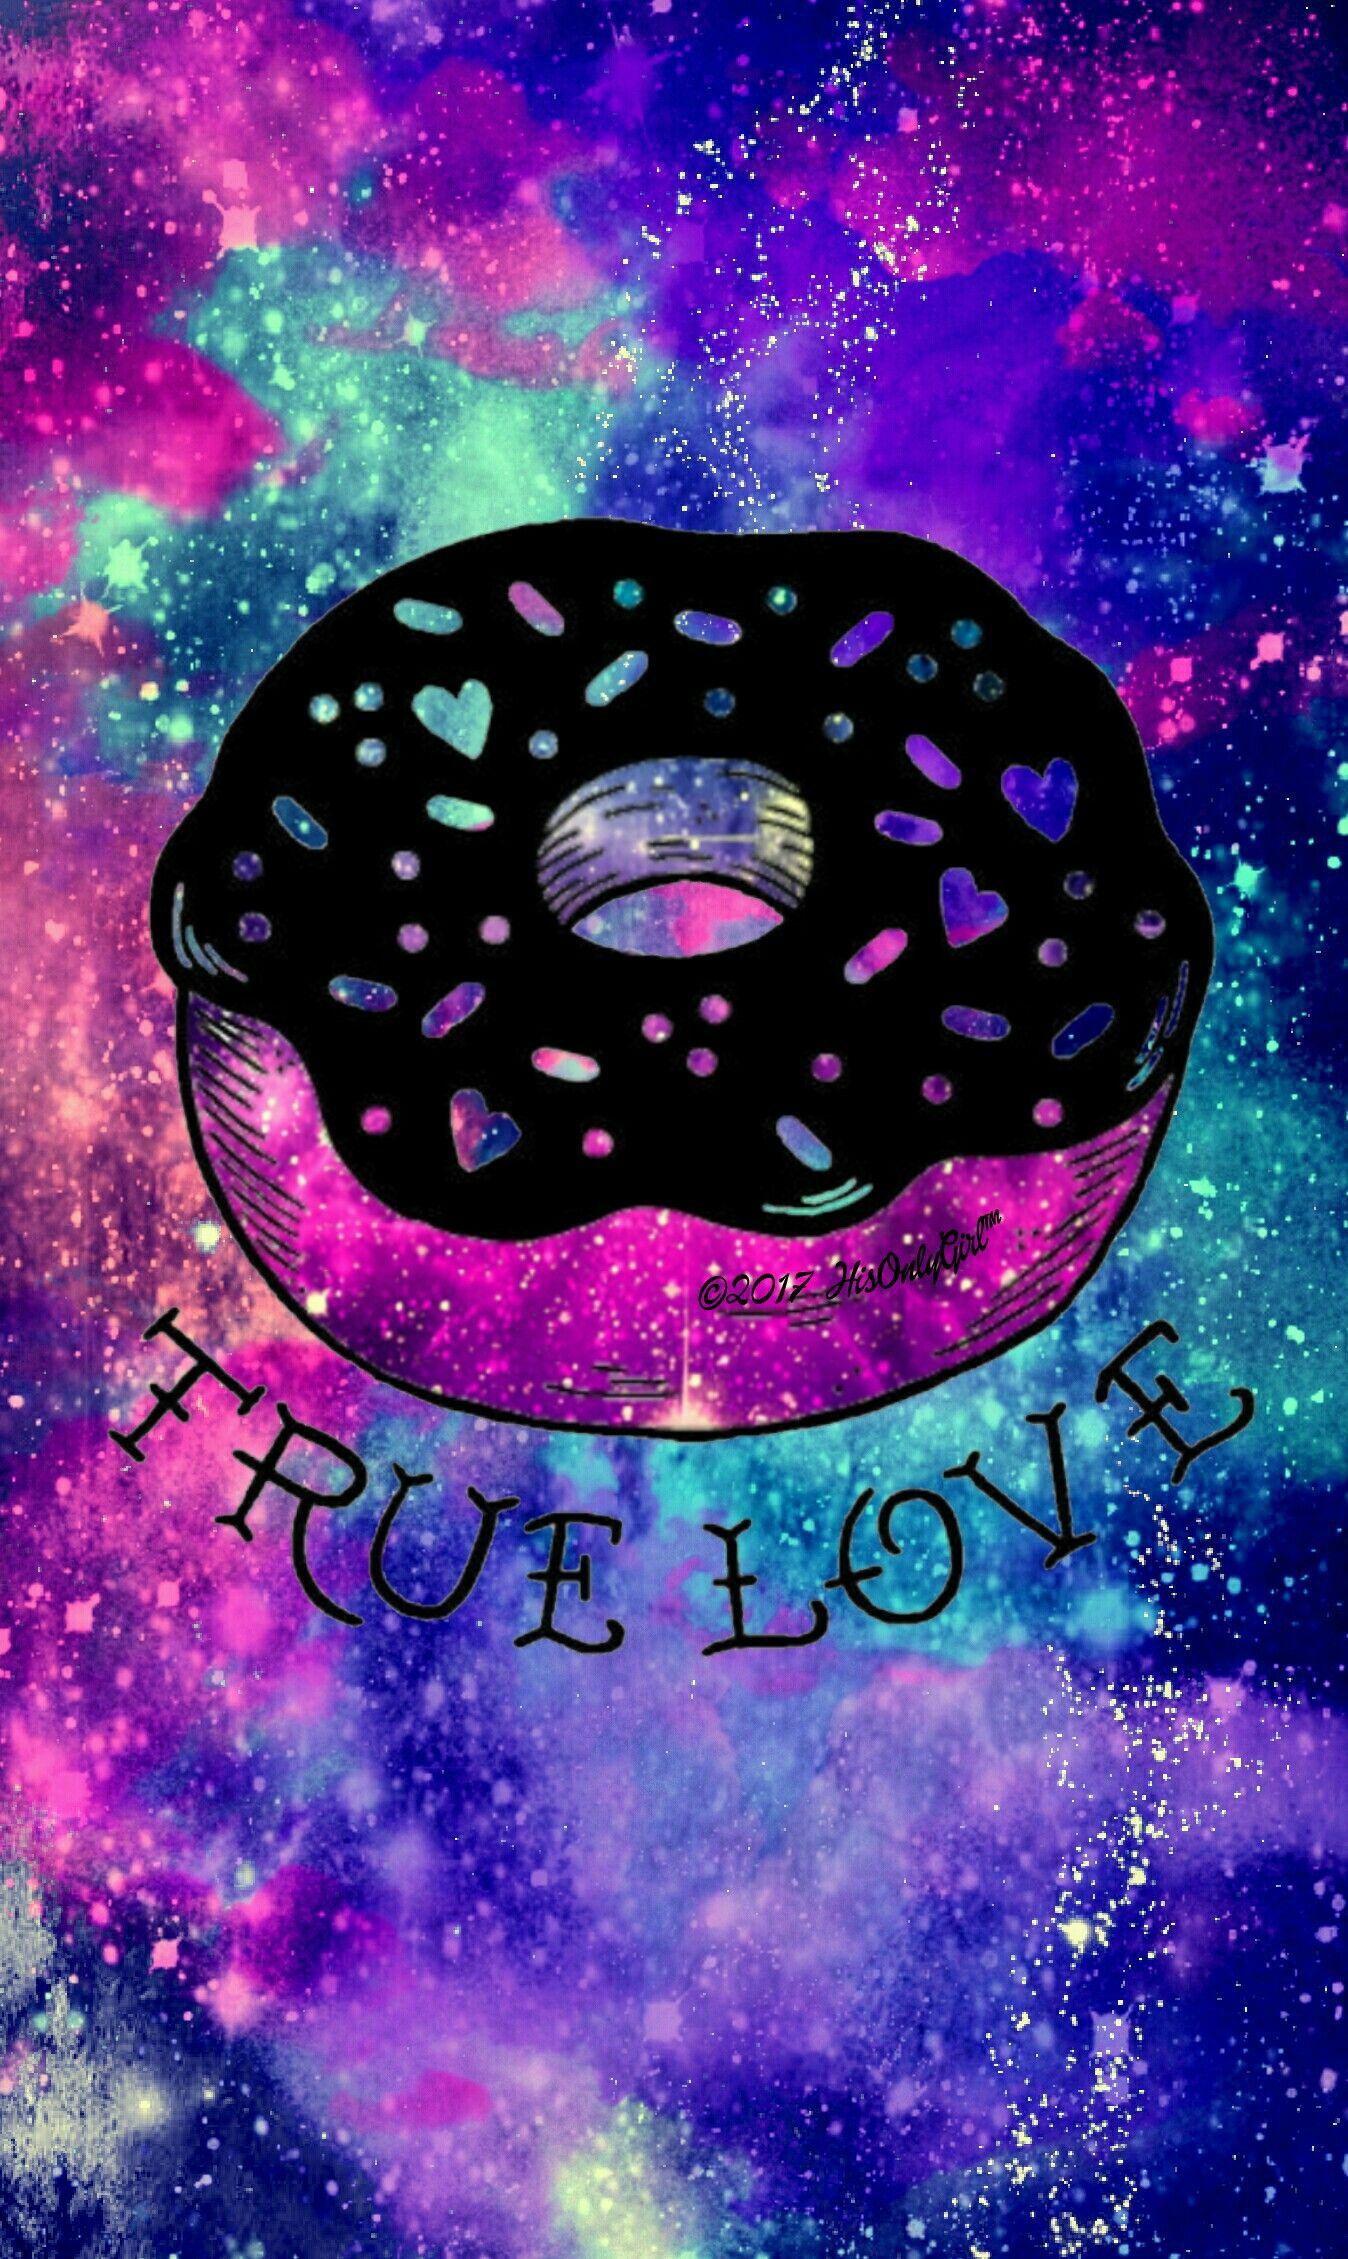 True Love Donut Galaxy Wallpaper I Created For The App Cocoppa Unicorn Wallpaper Galaxy Wallpaper Cute Emoji Wallpaper